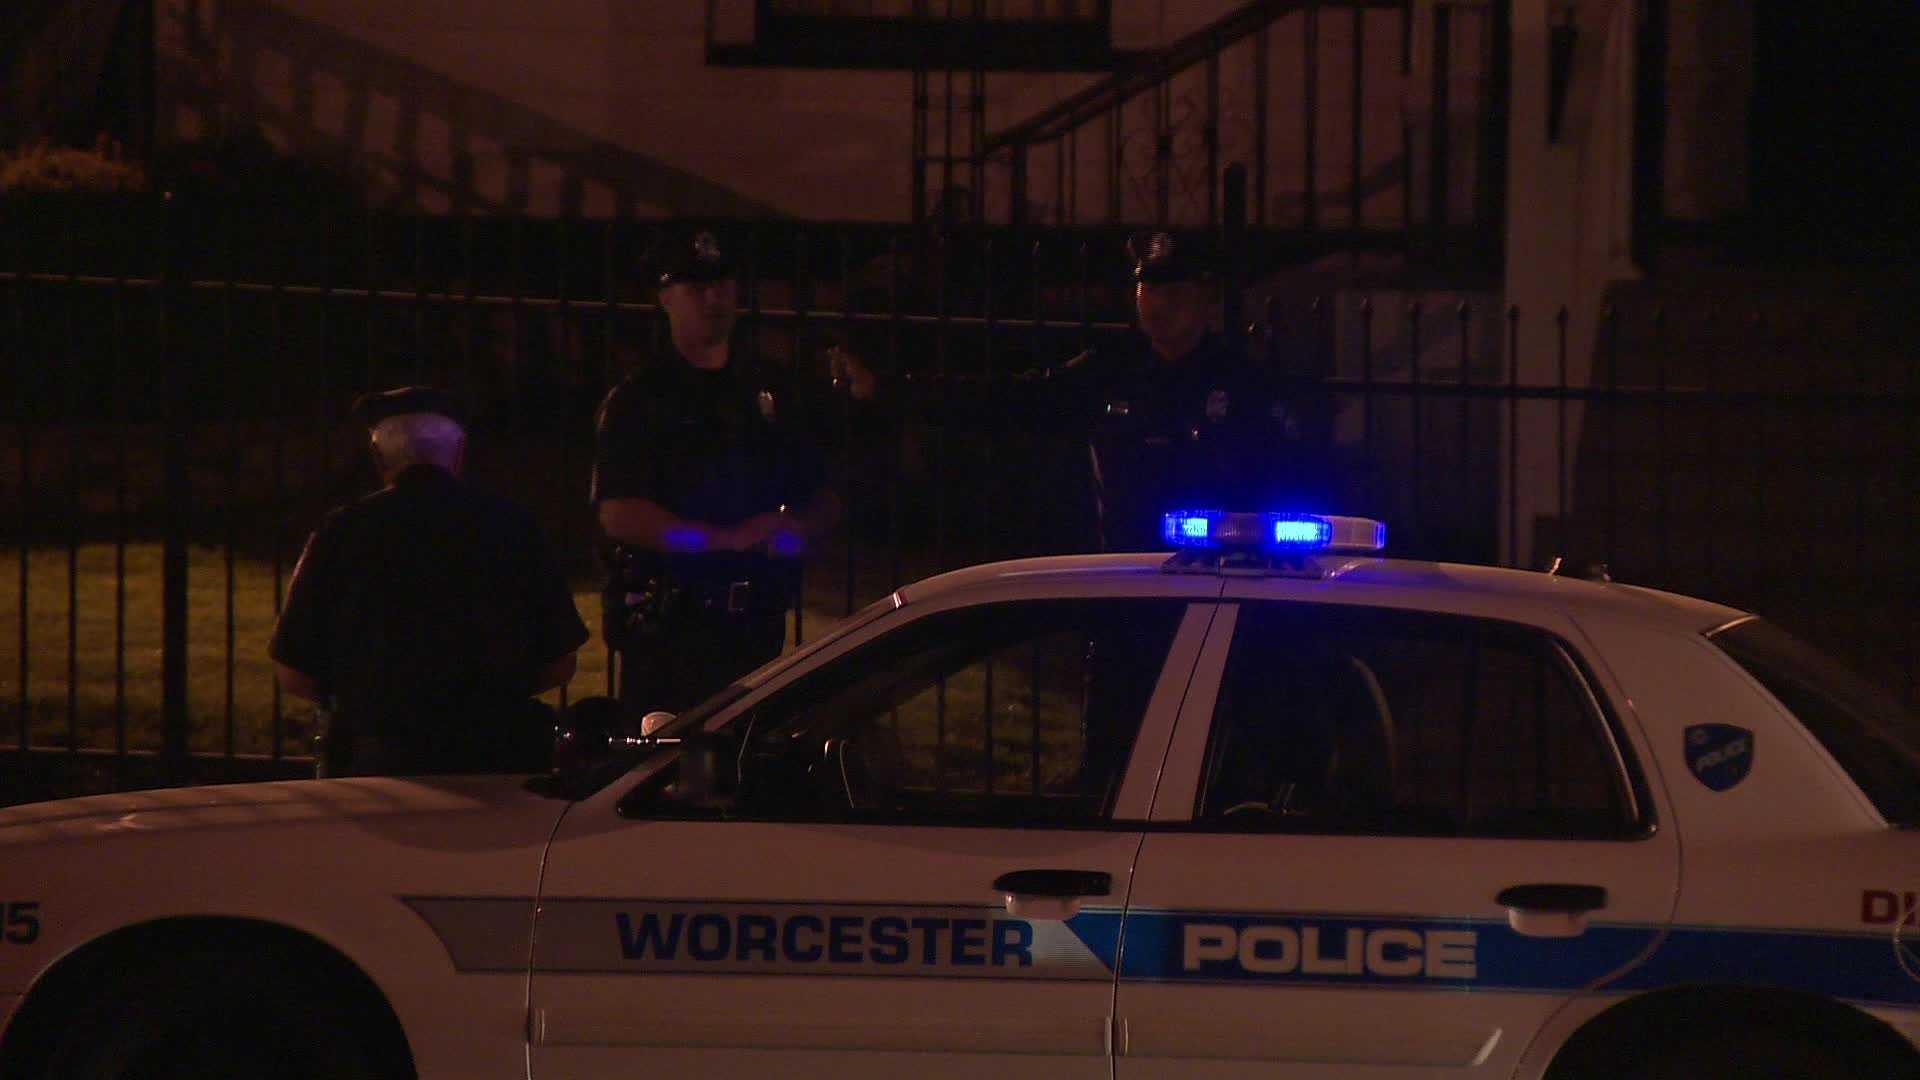 Worcester Police Funeral Home 051313.jpg